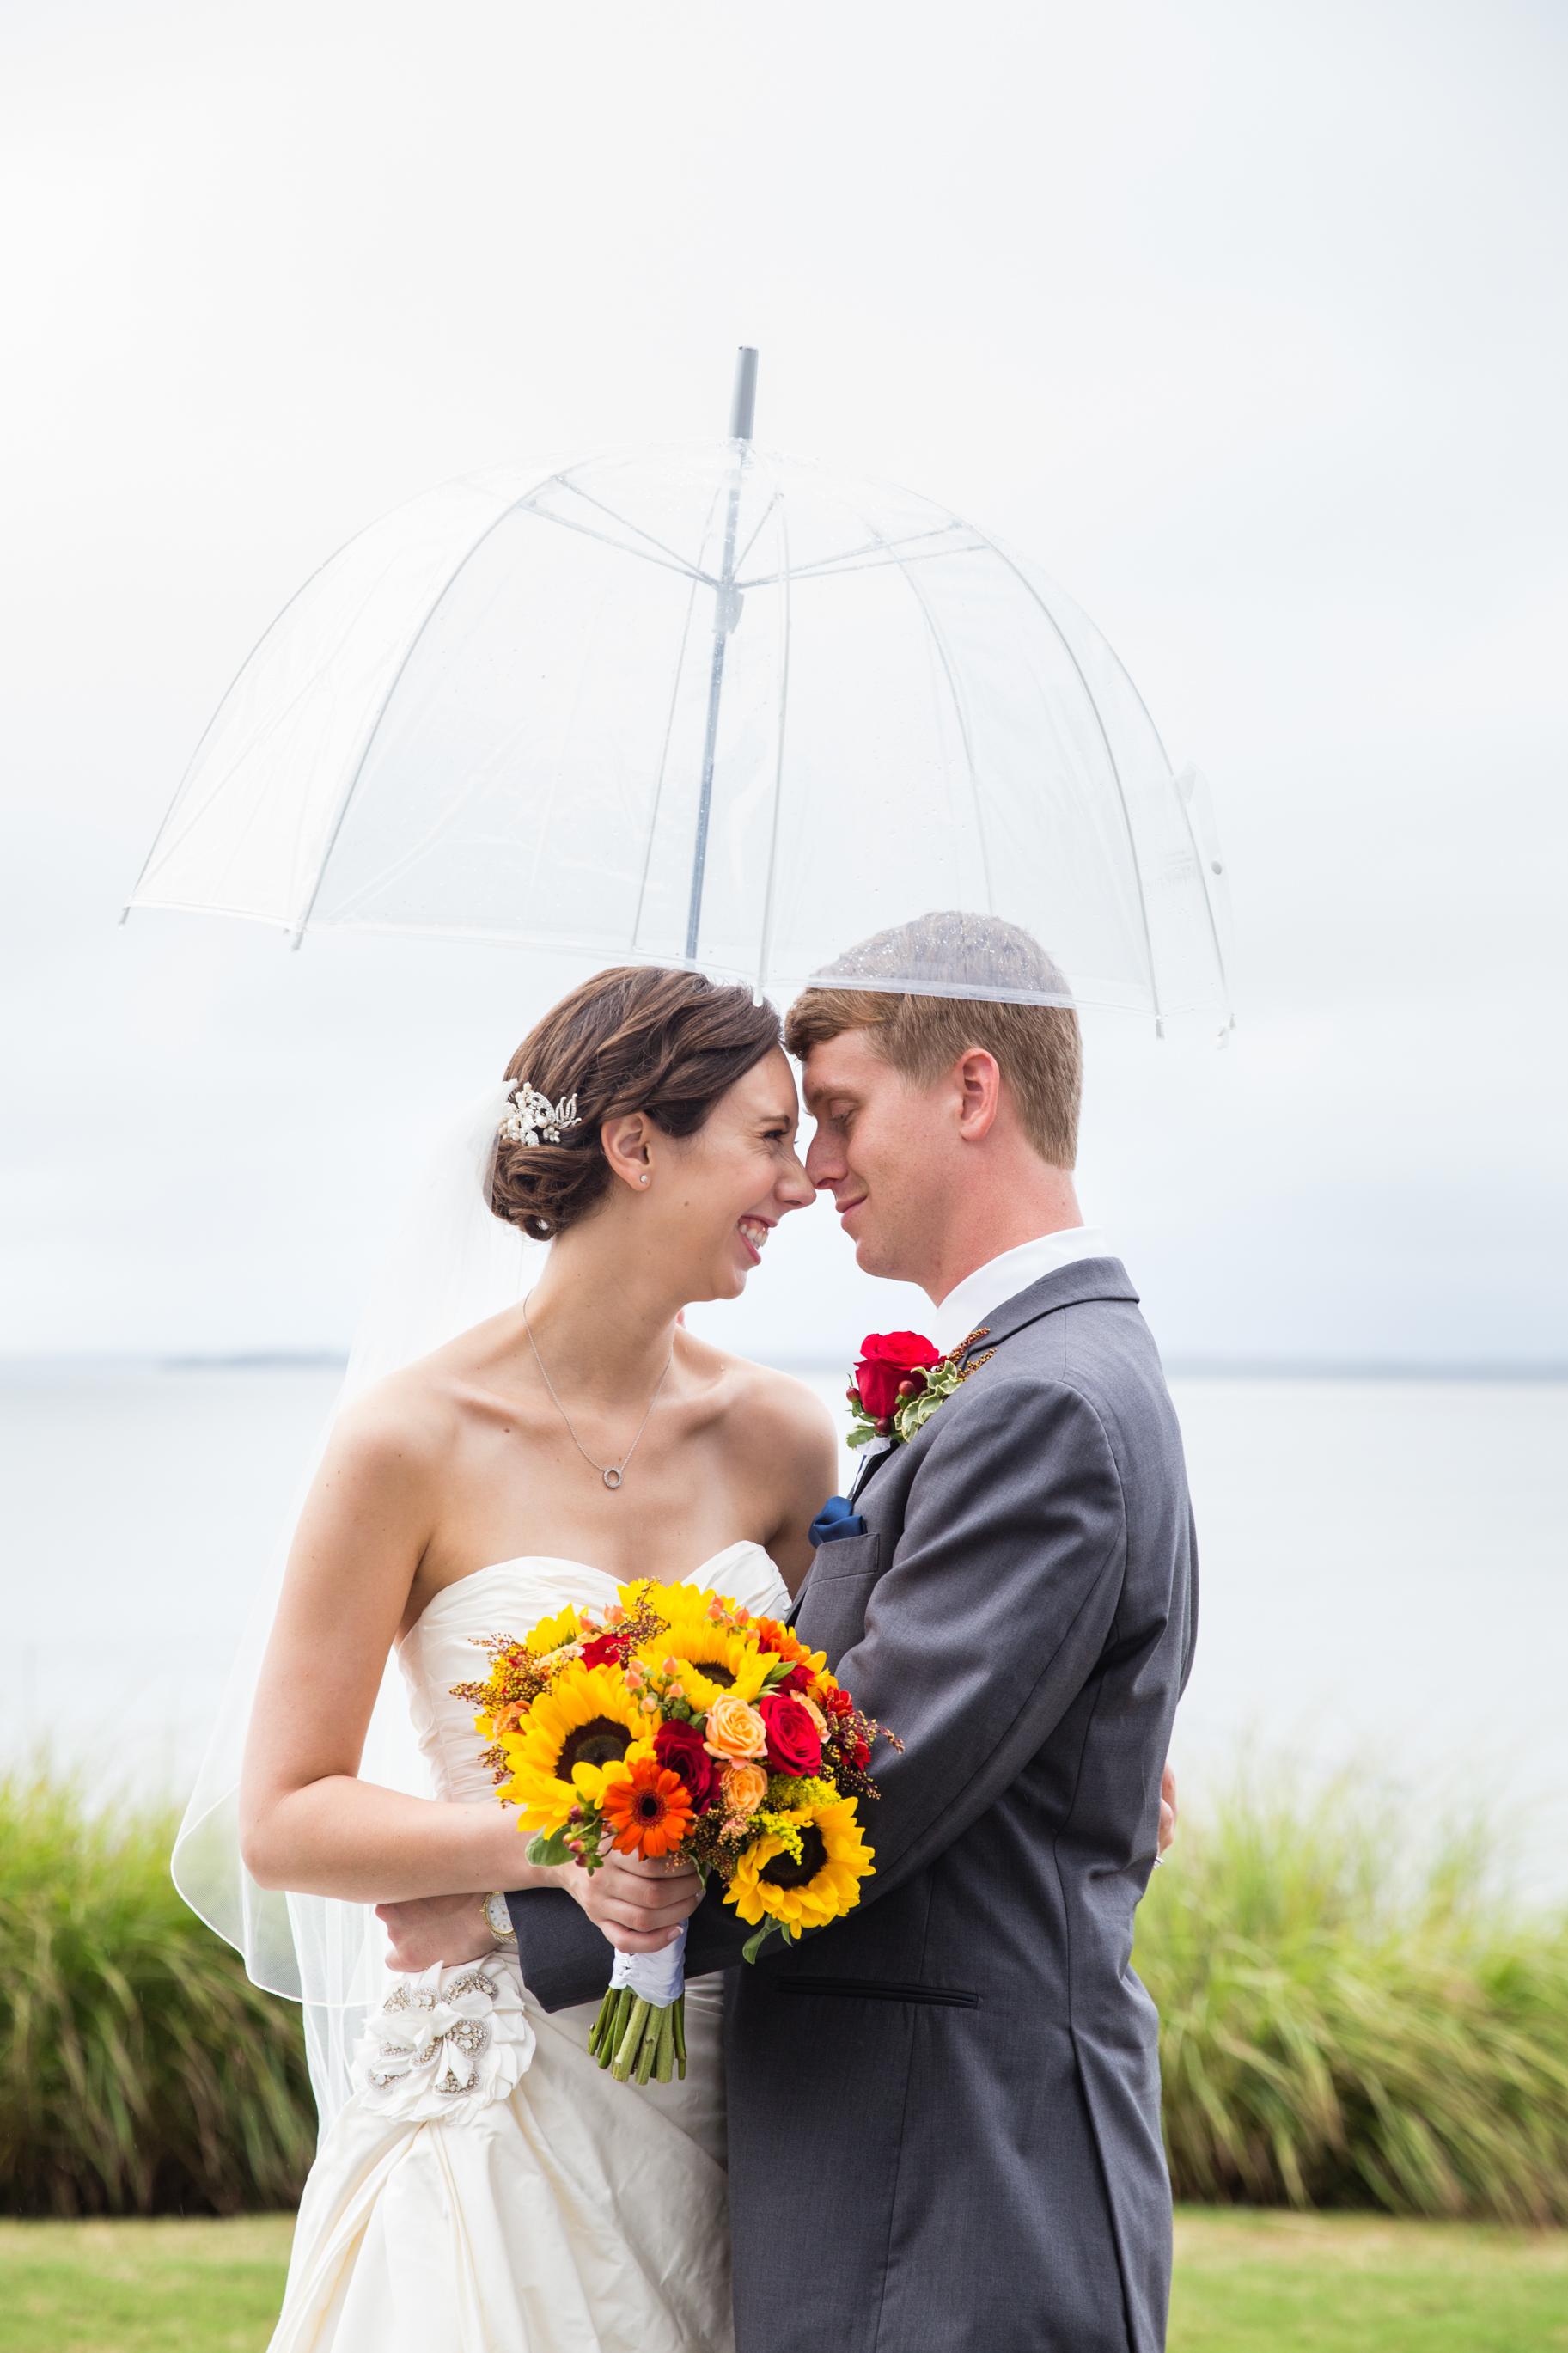 WeddingPortfolio2016-62.jpg